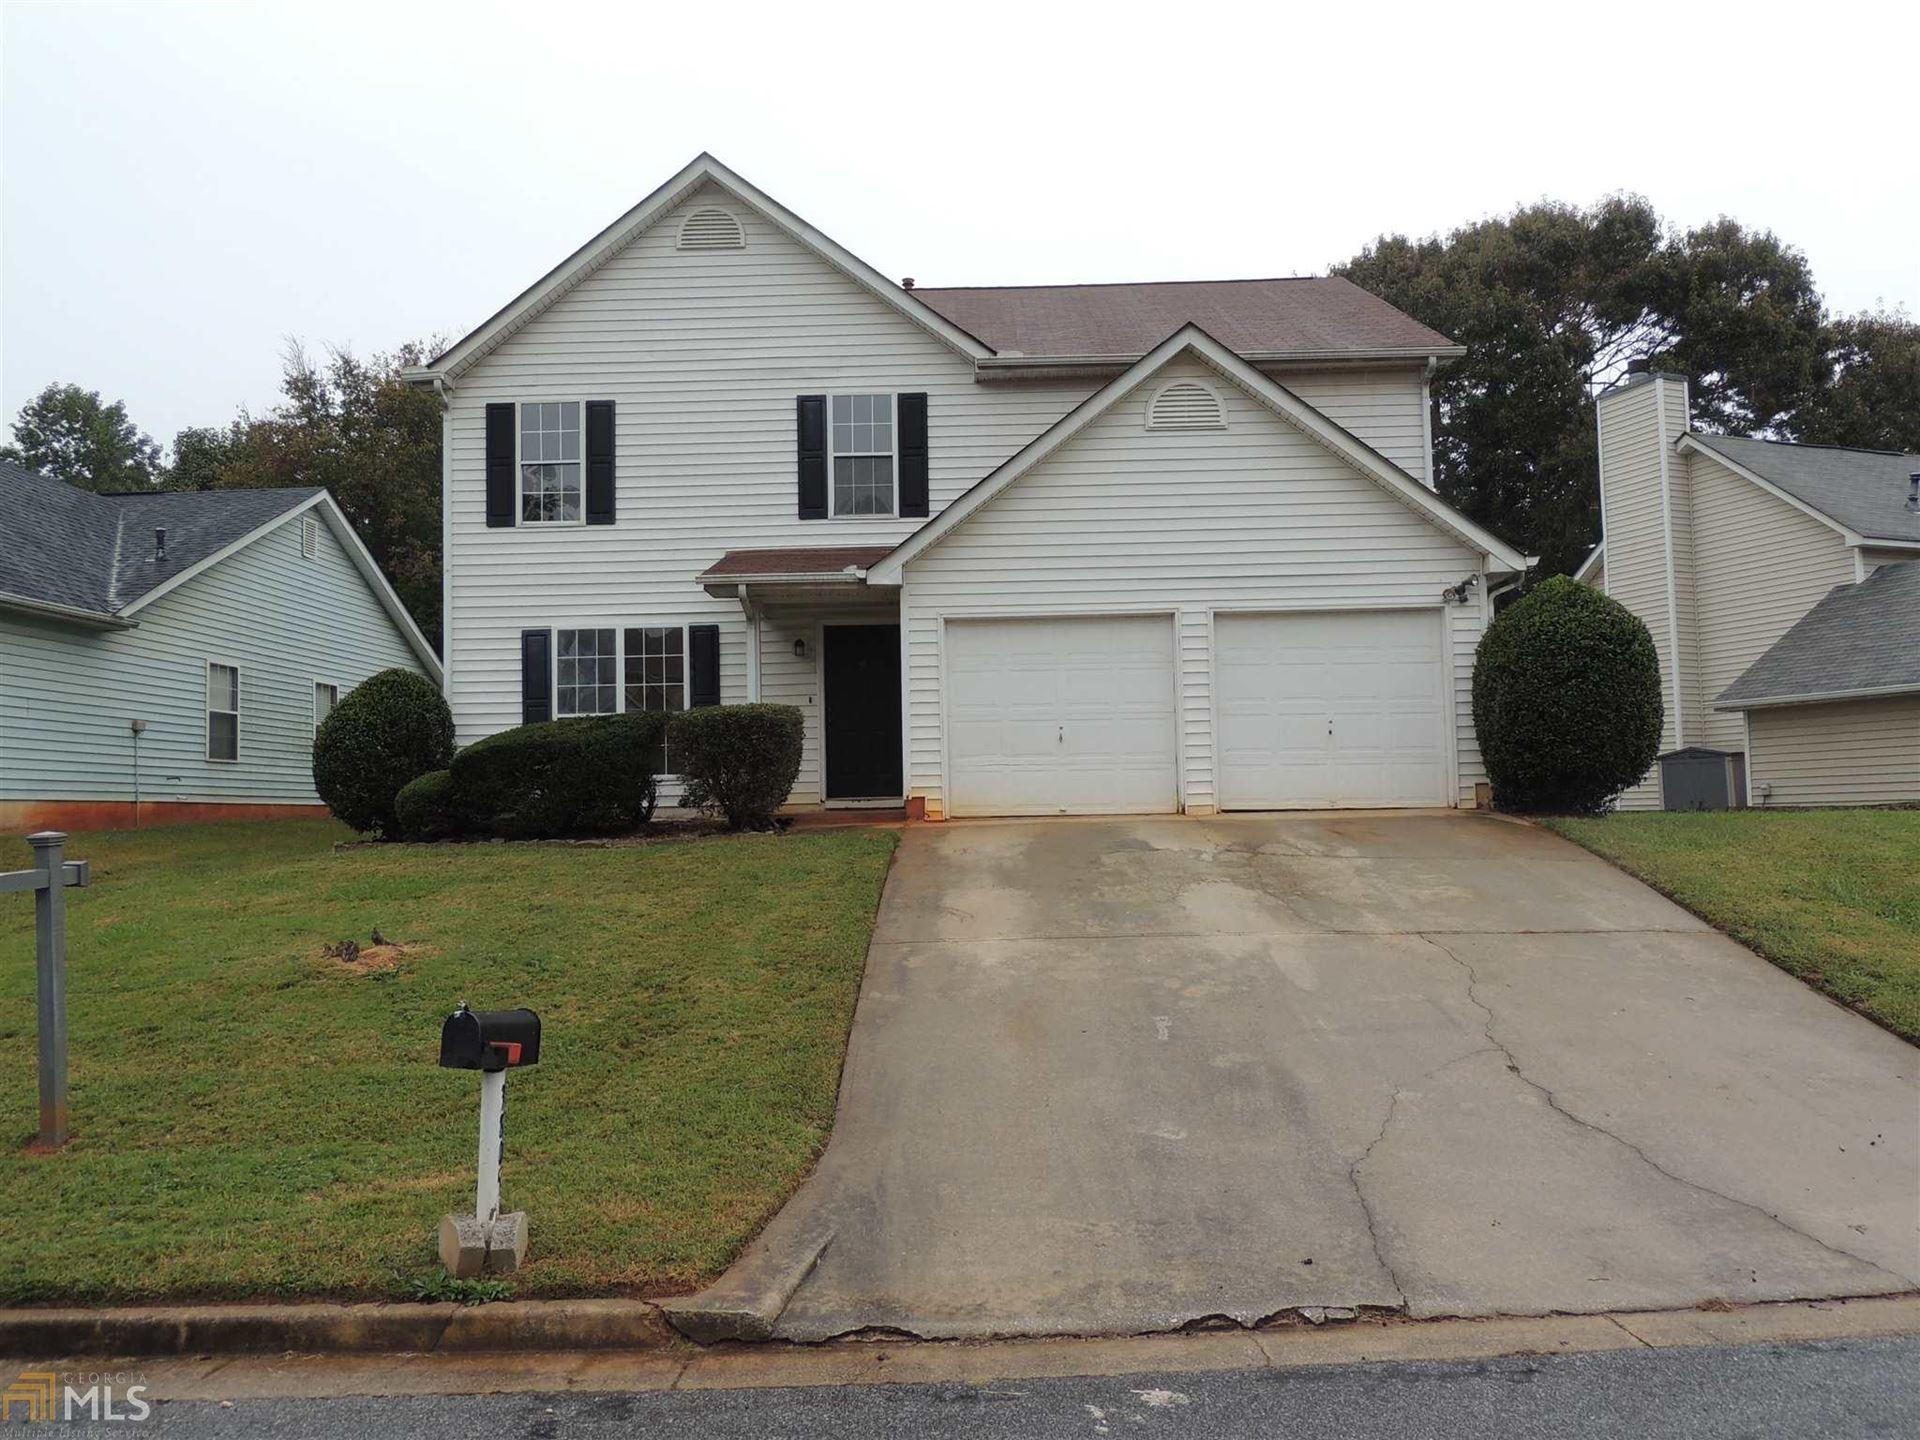 3805 Landgraf Cv, Decatur, GA 30034 - MLS#: 8871085